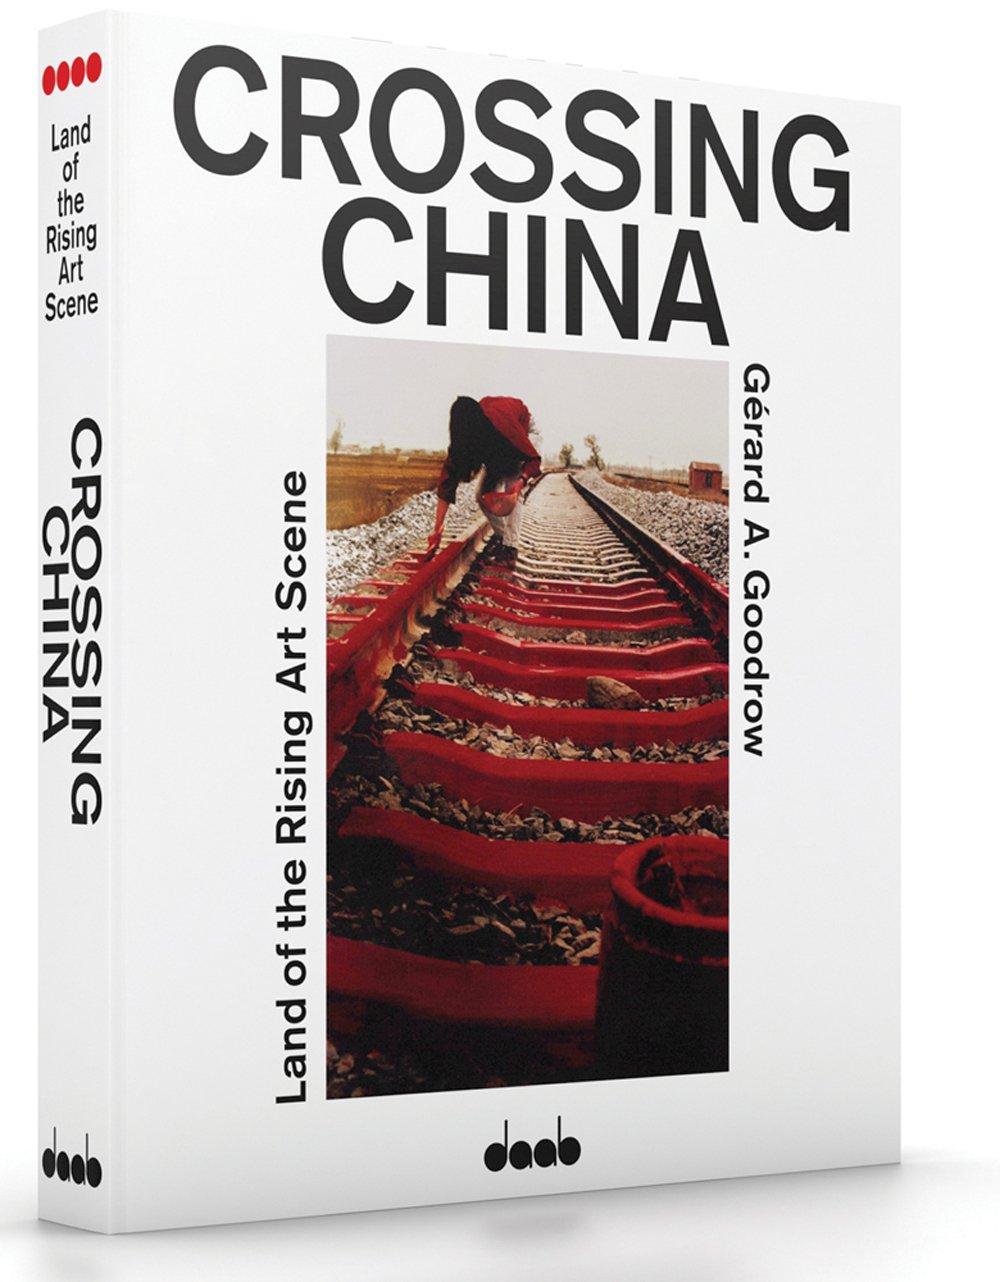 Crossing China: Land of the Rising Art Scene